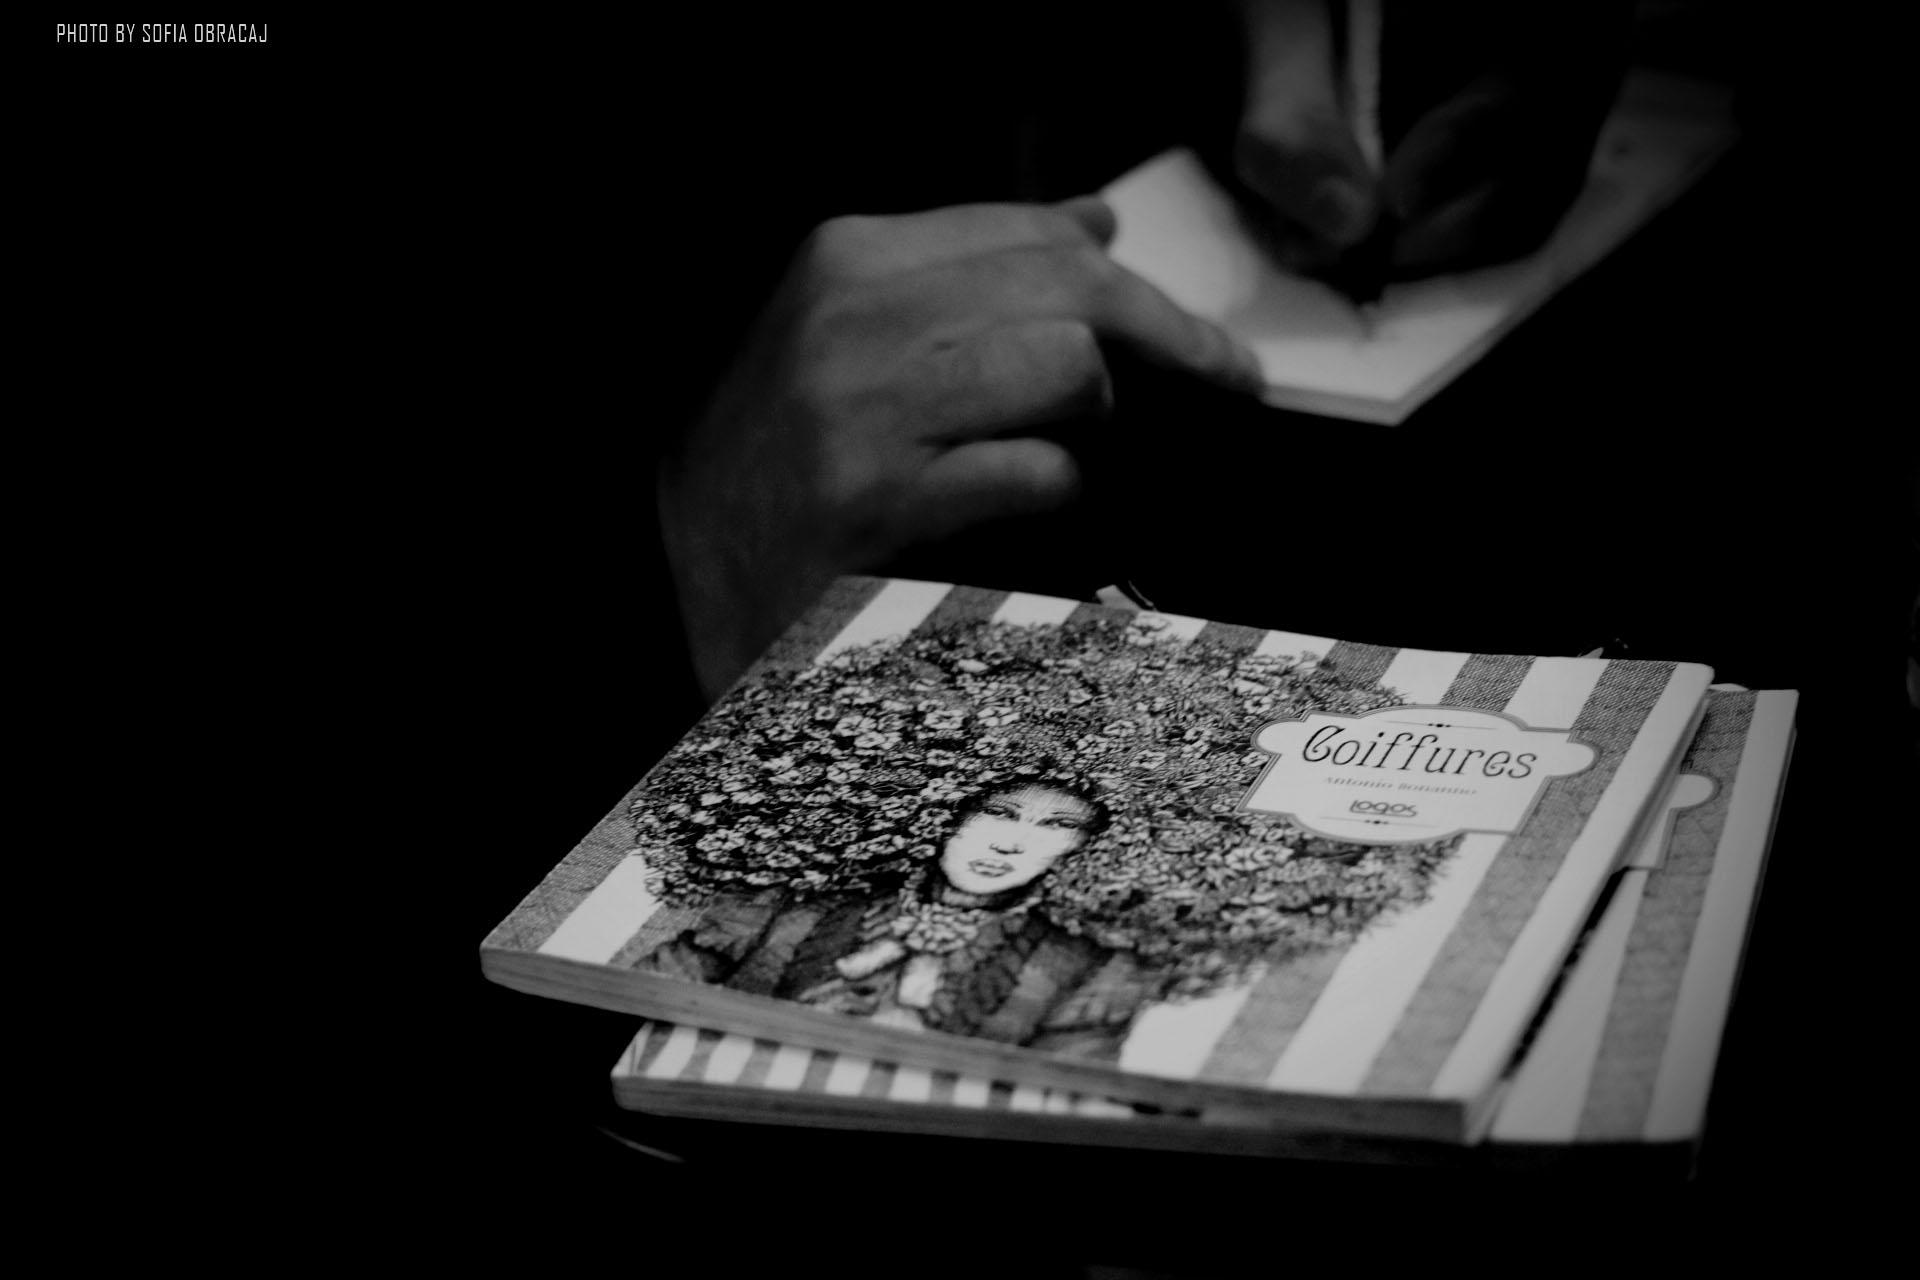 Coiffures di Antonio Bonanno, edizioni Logos